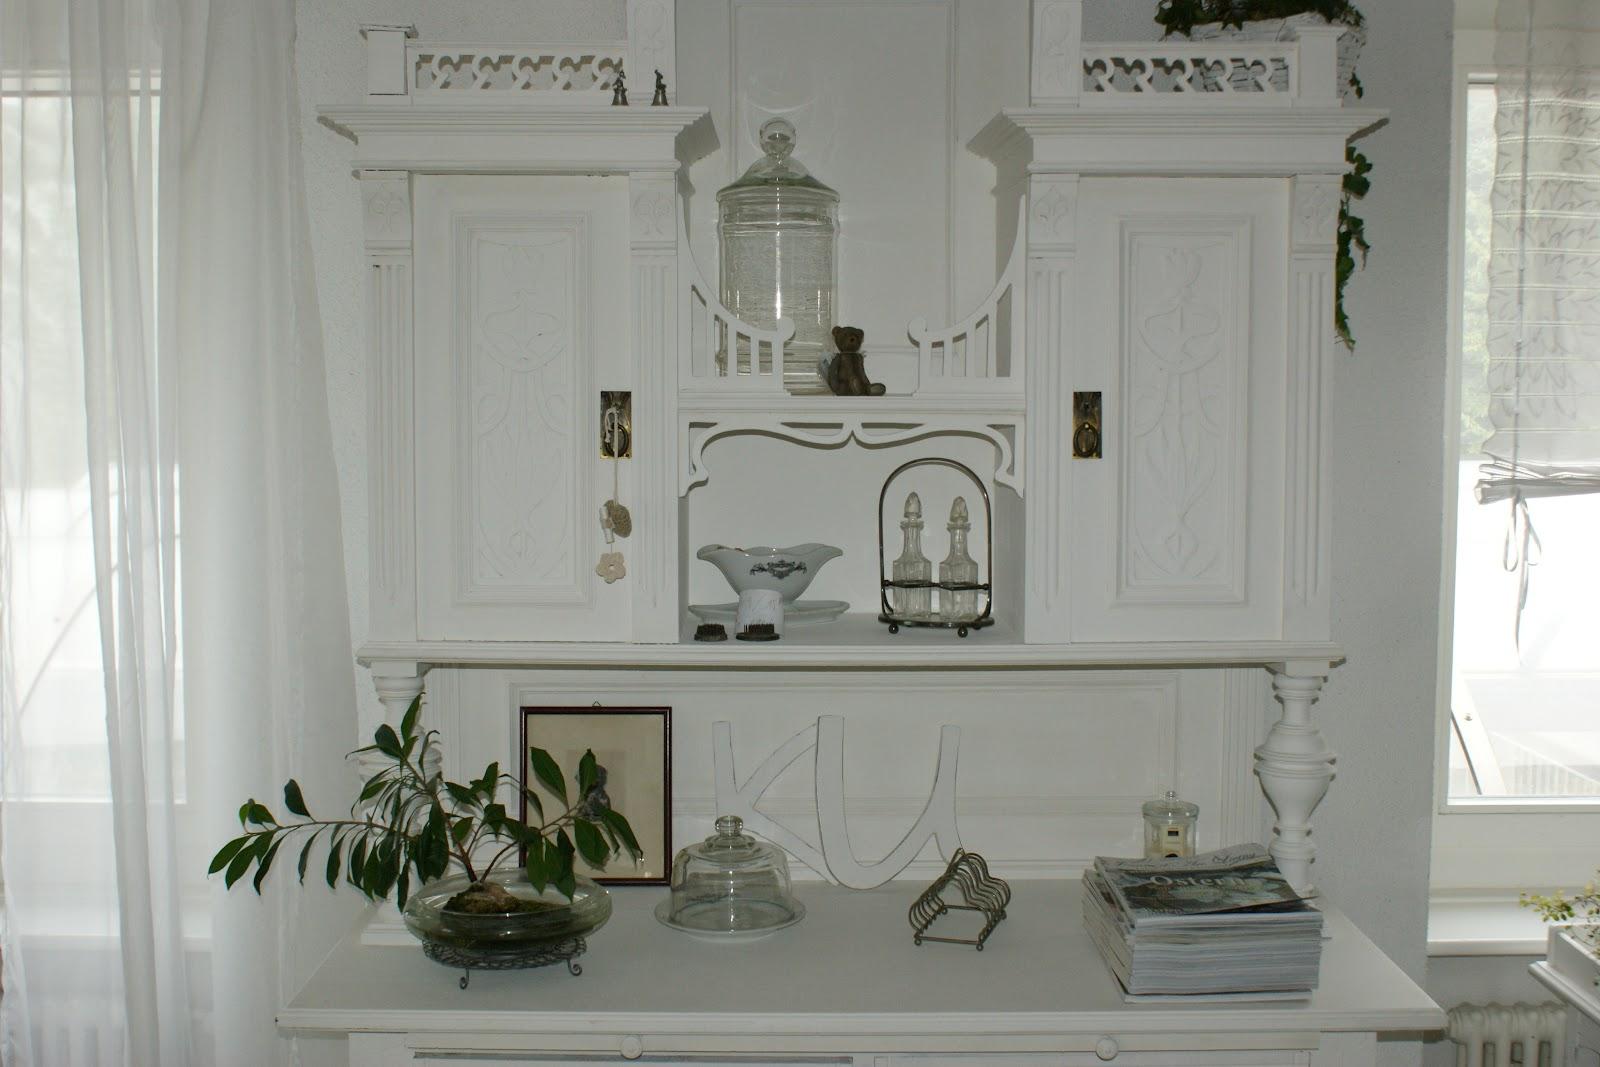 willy 39 s shabby chic schaffhausen neues buffet ist fertig. Black Bedroom Furniture Sets. Home Design Ideas